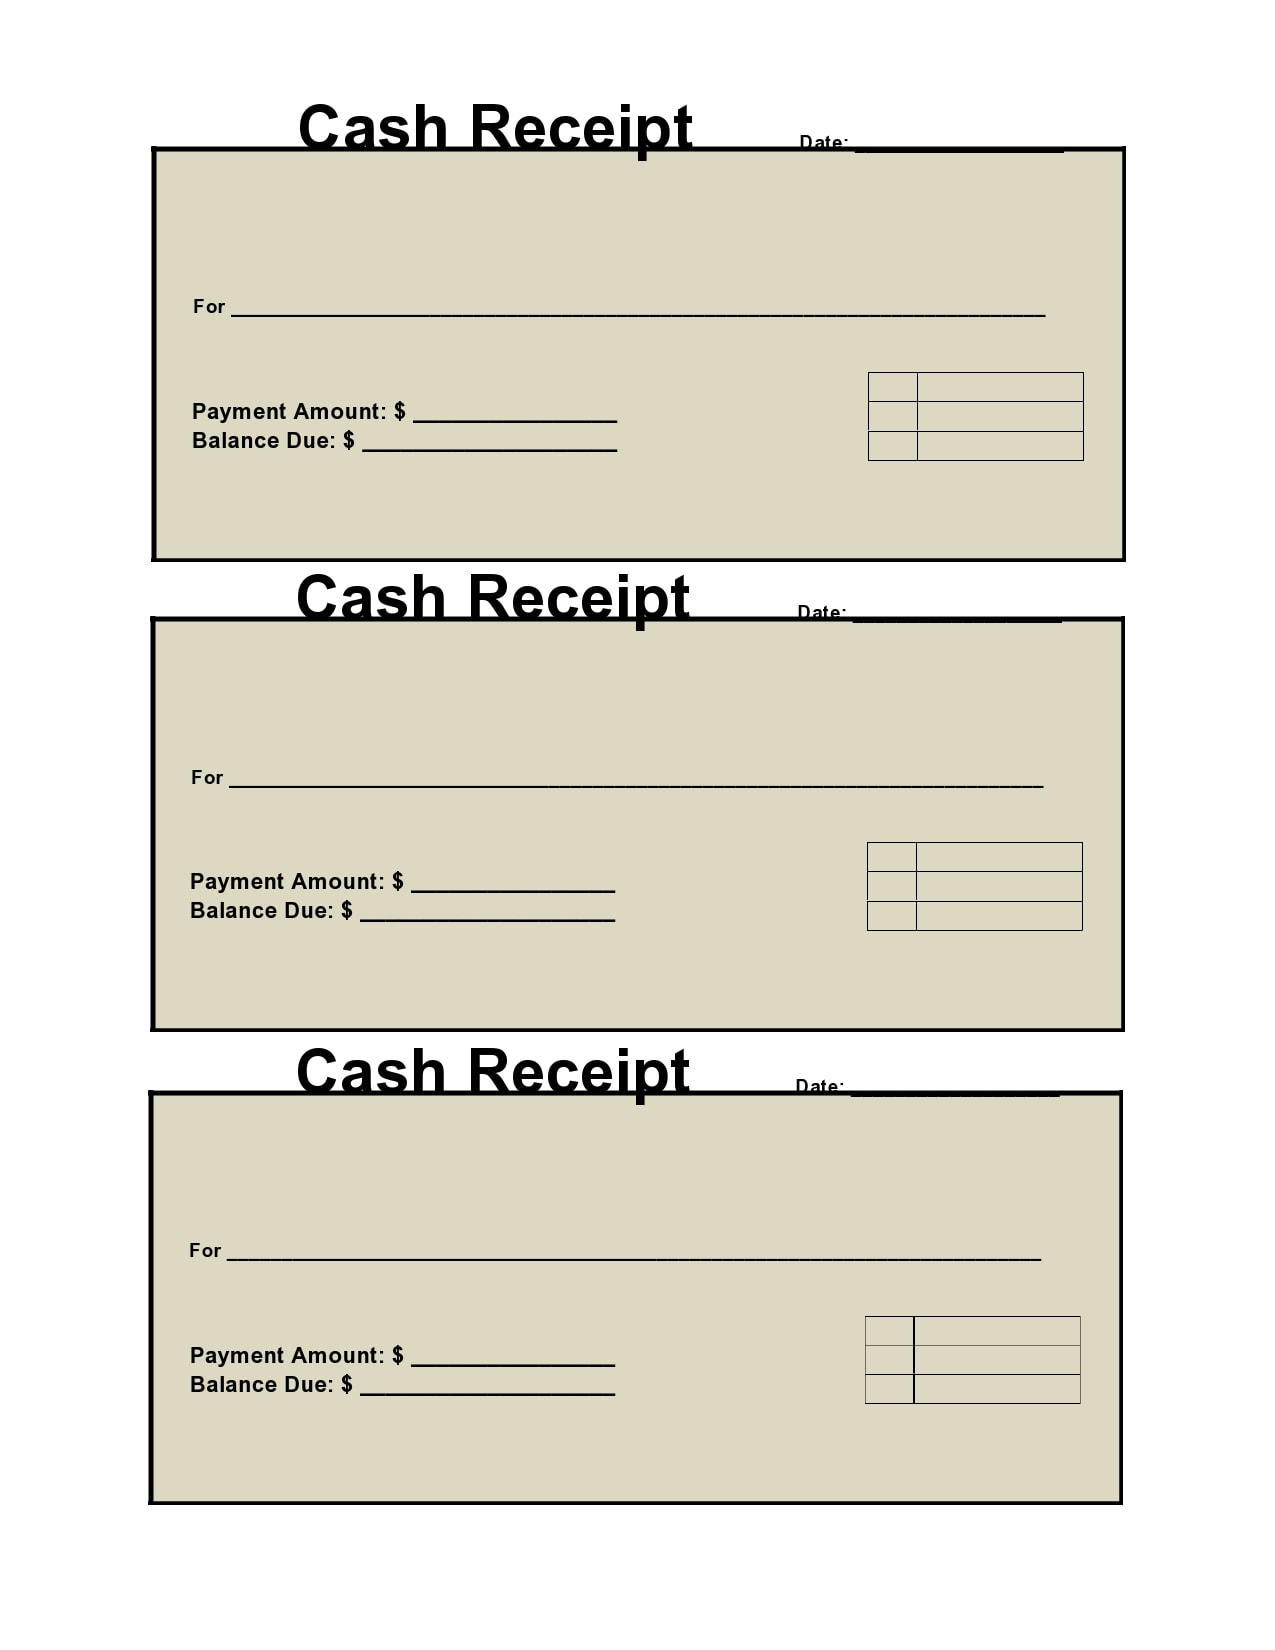 cash receipt 09